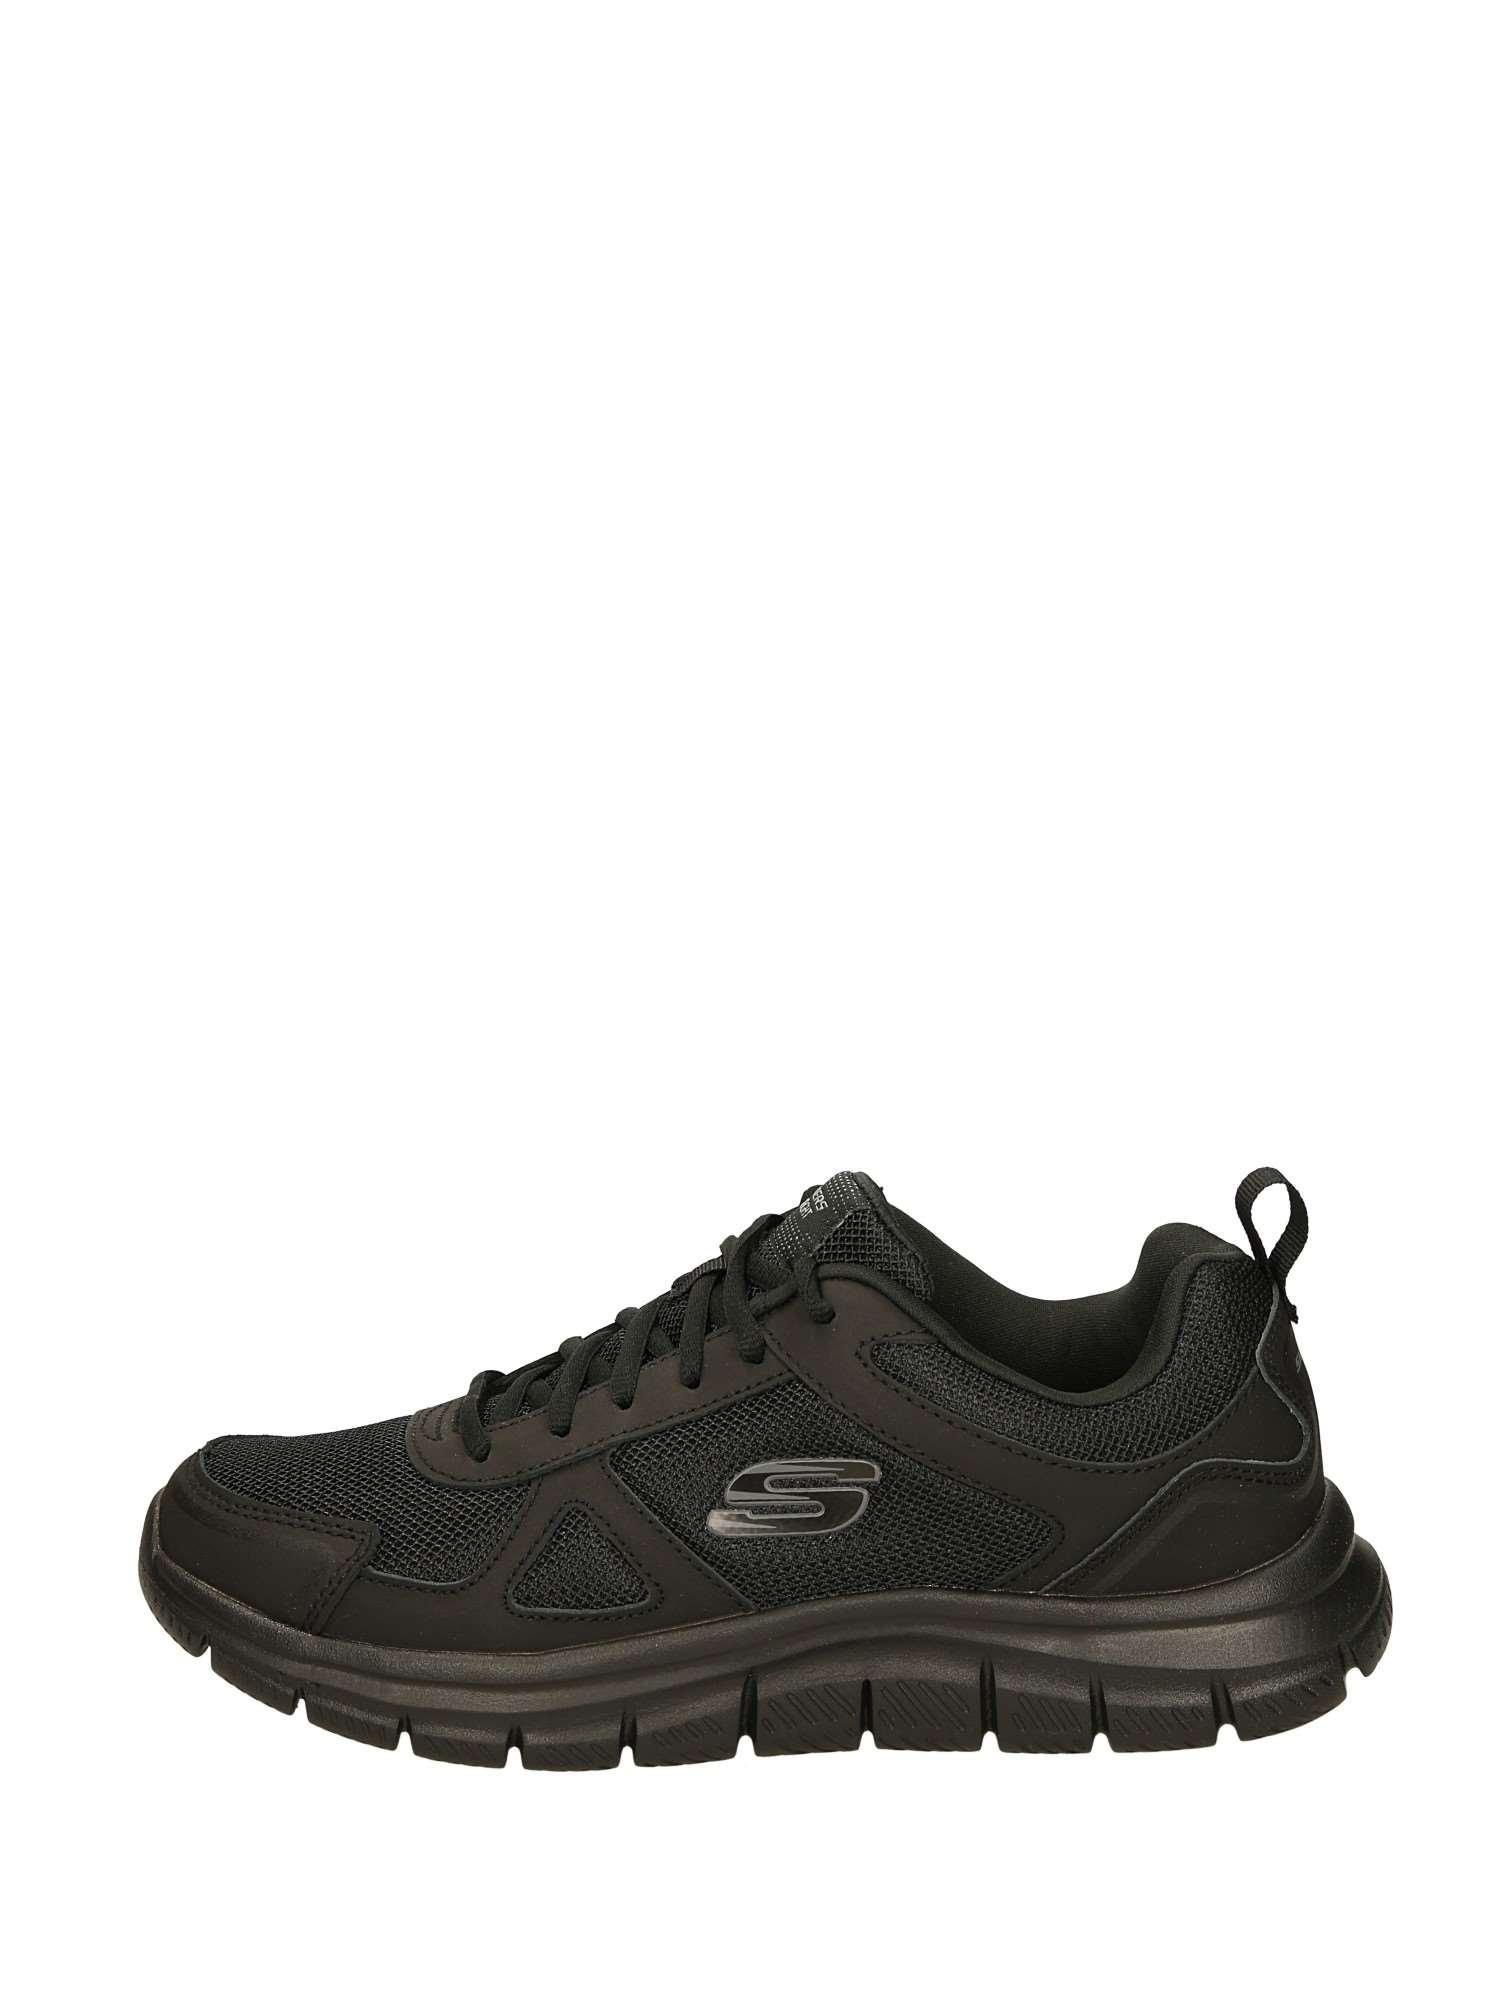 Skechers Sneakers Basse Uomo Nero | Lalilina